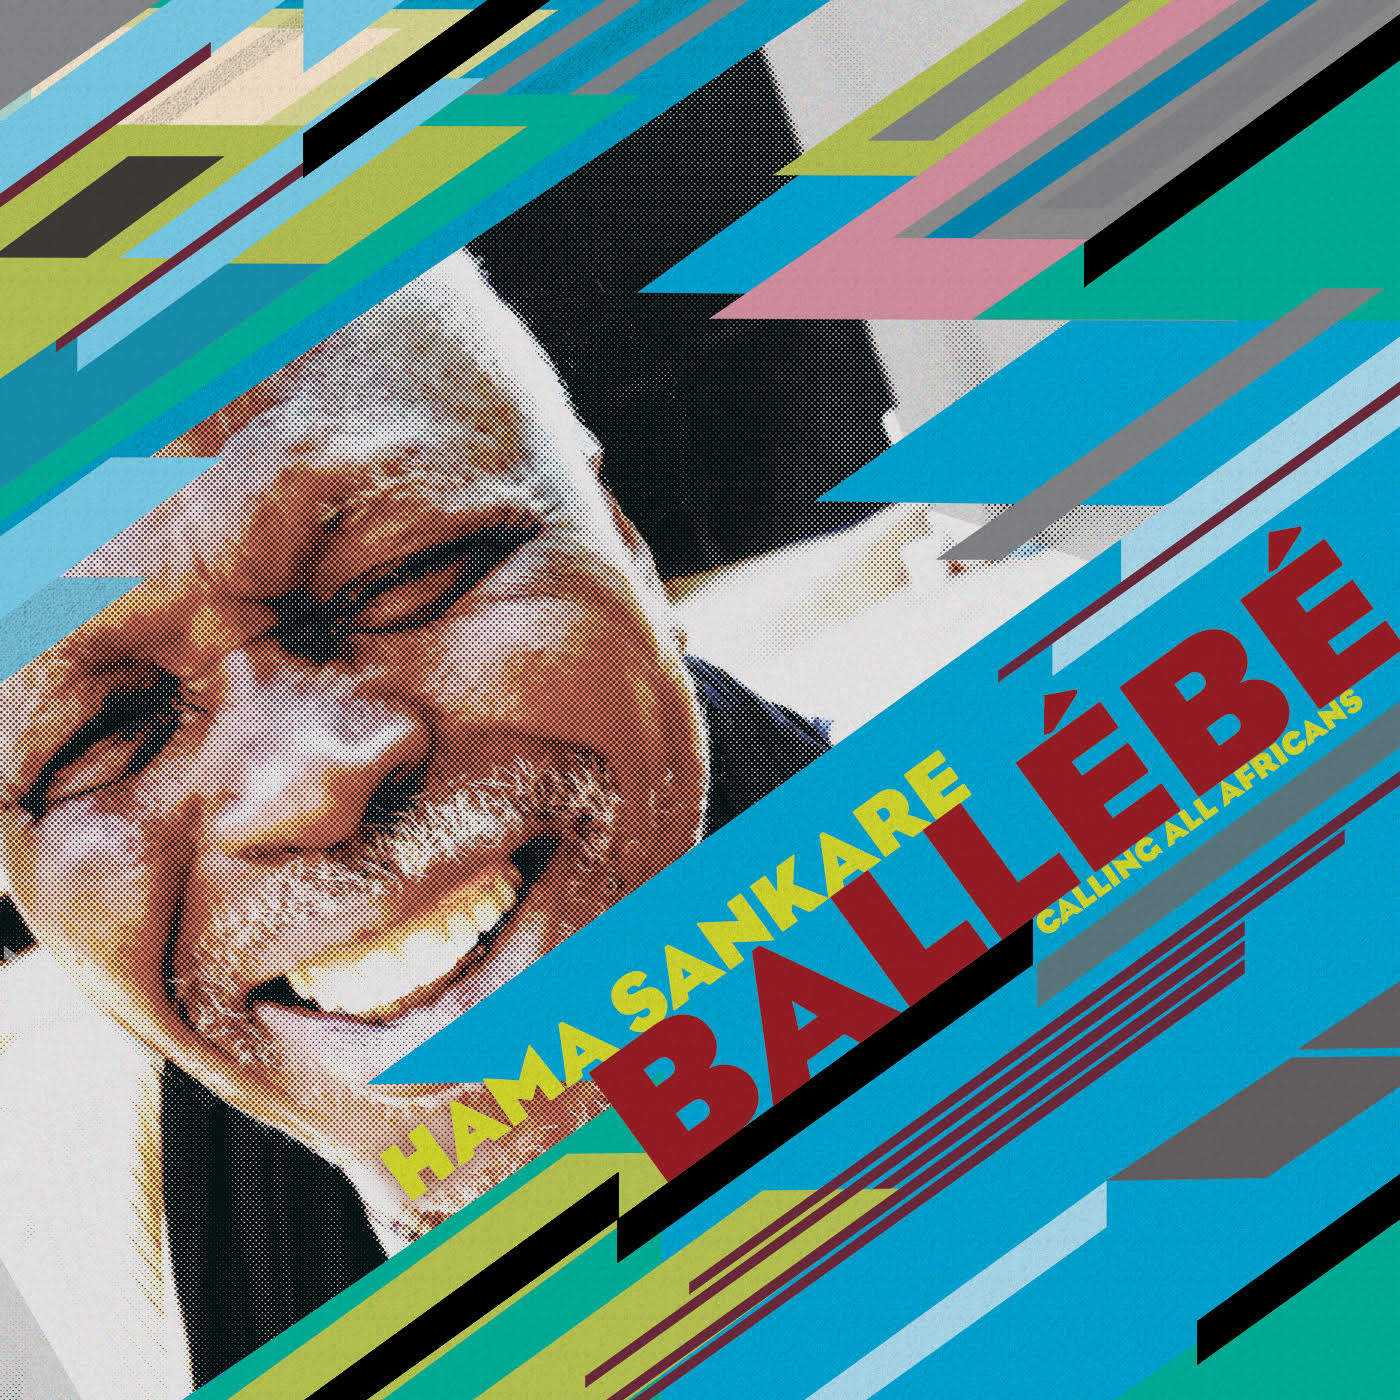 Hama Sankare - Ballebe (CLE018)